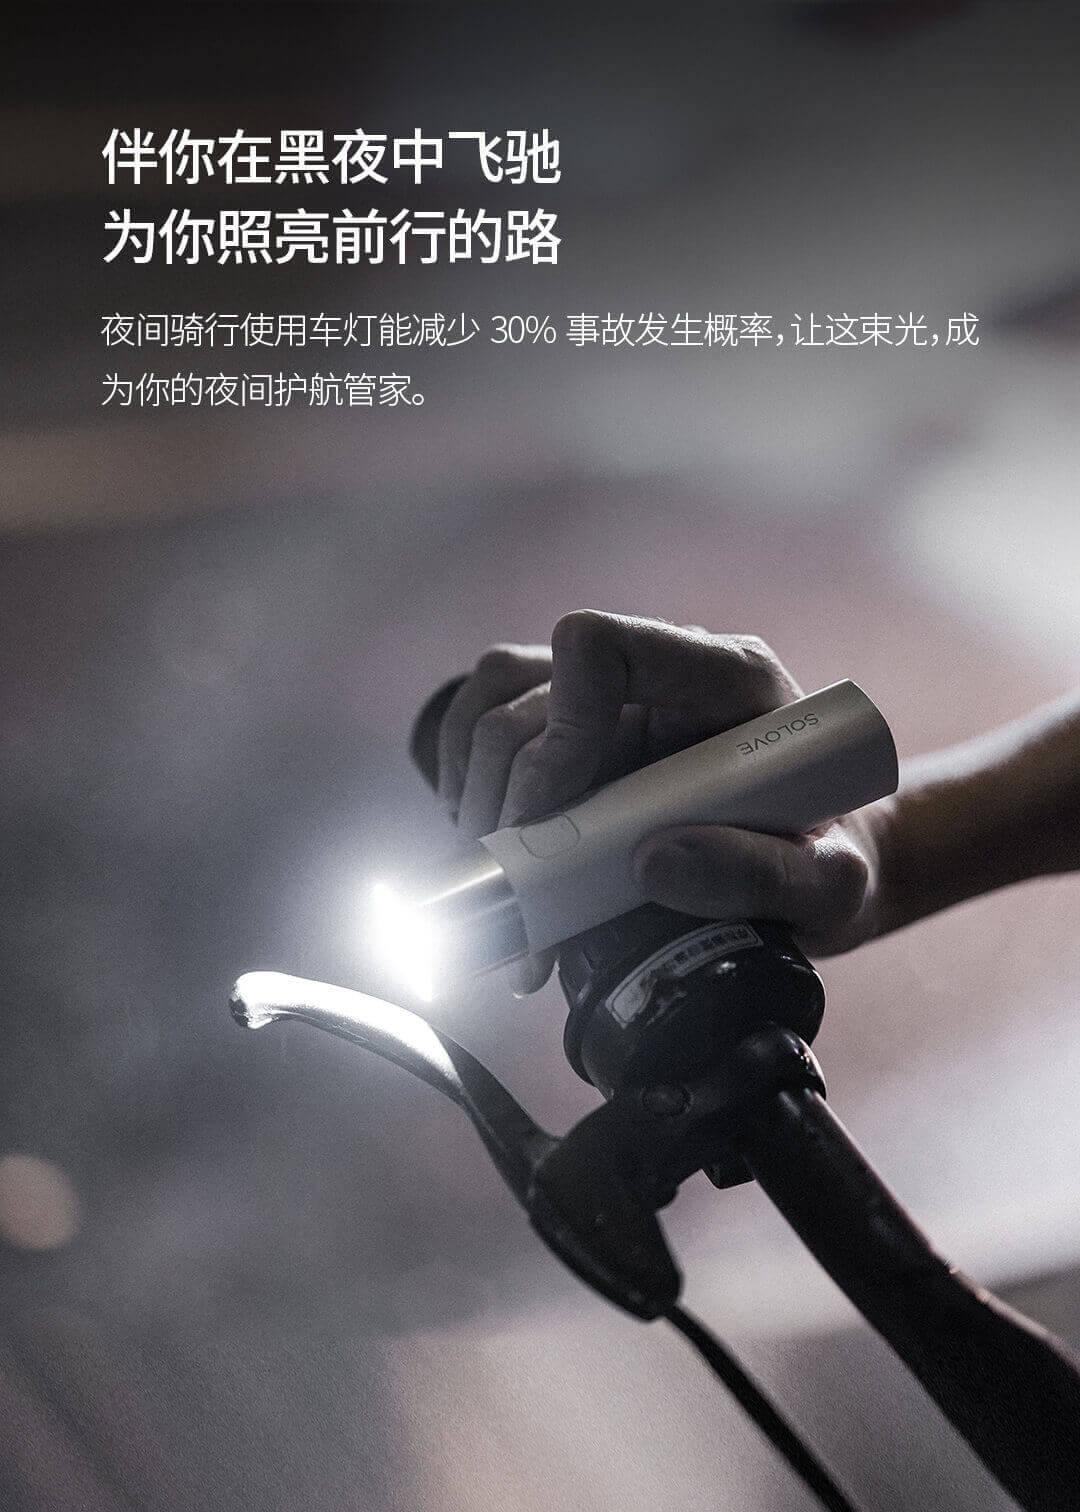 product_奇妙_SOLOVE素乐随身手电筒移动电源